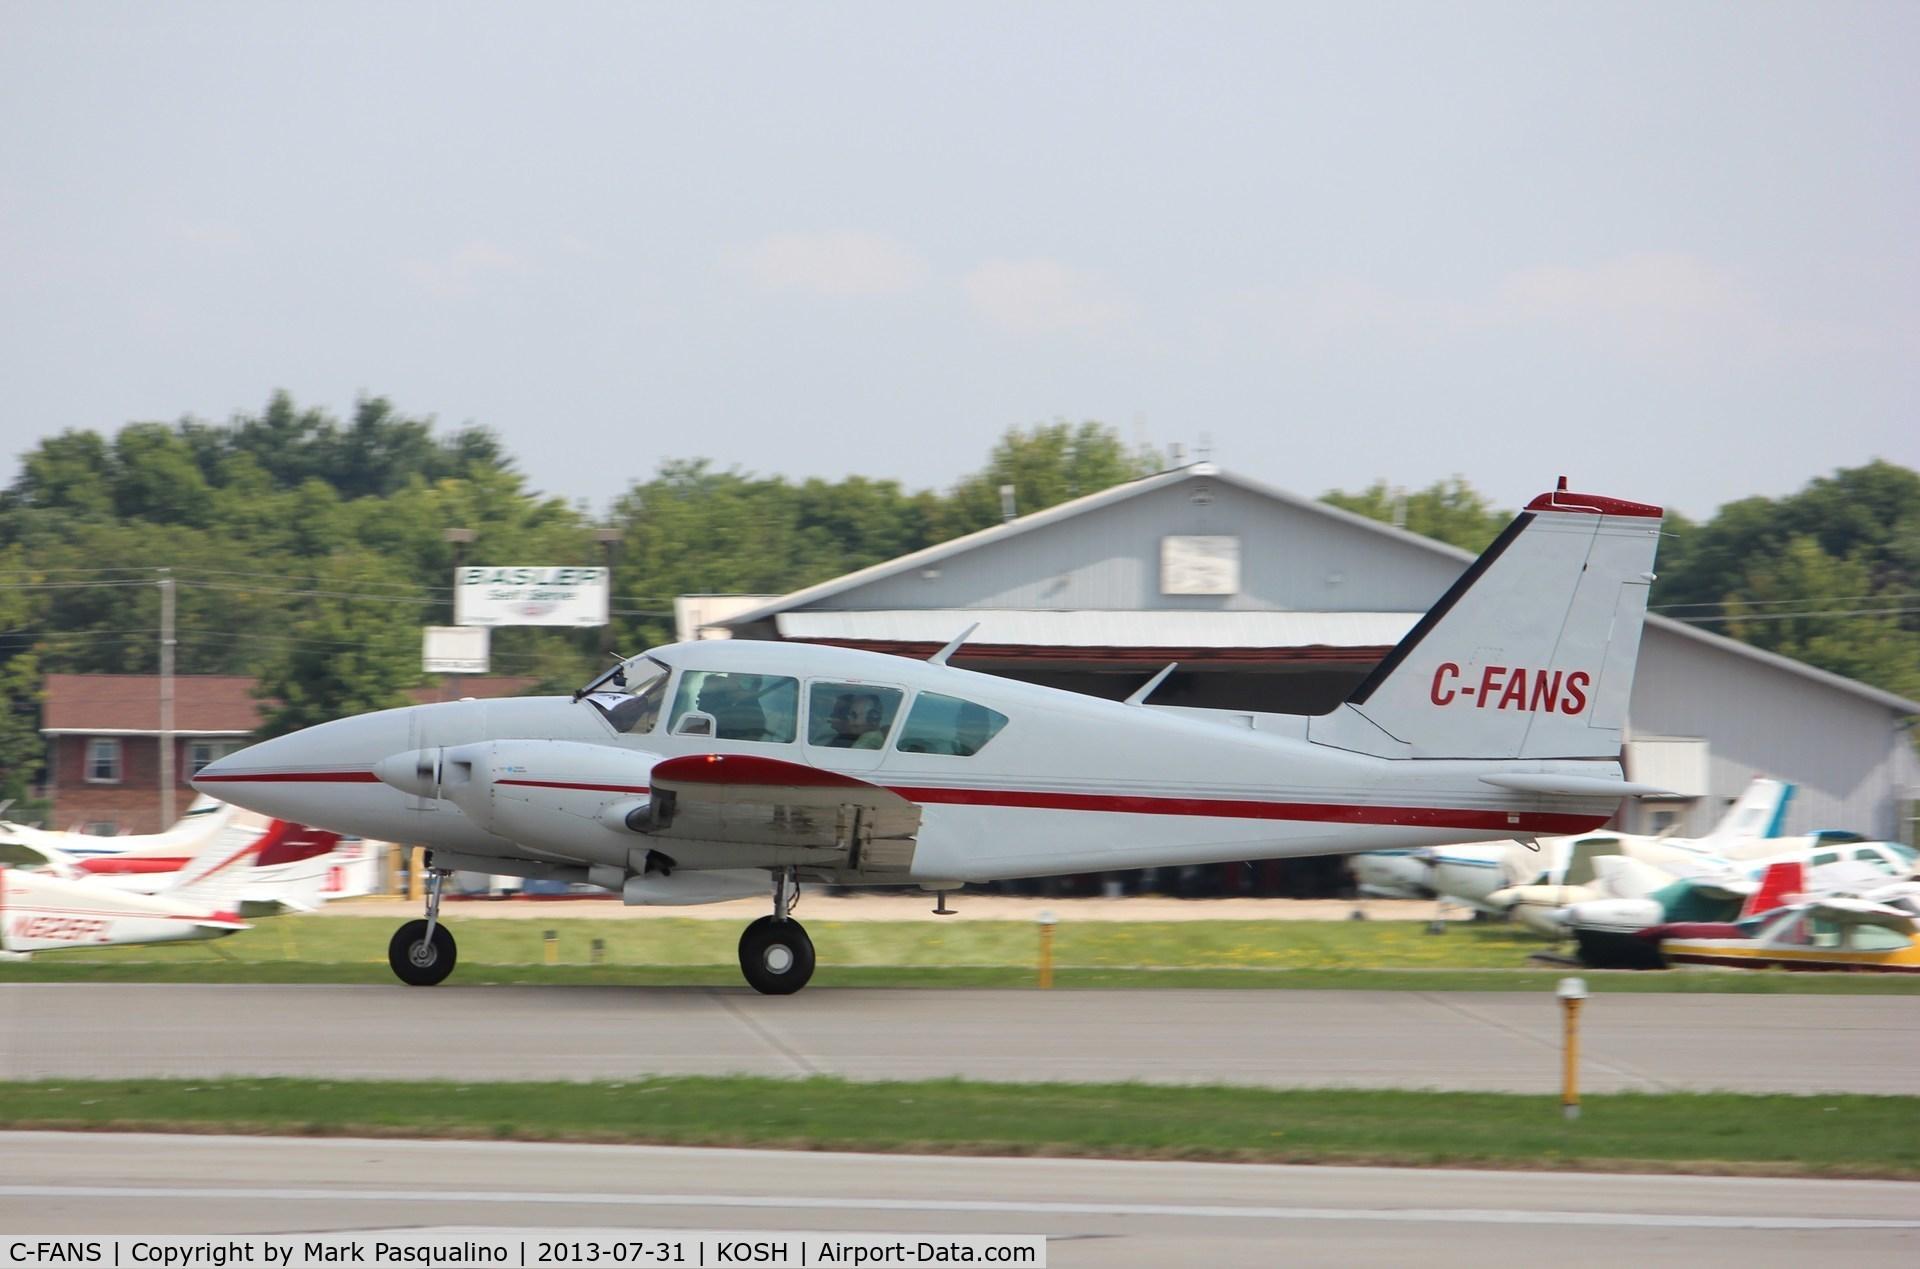 C-FANS, 1979 Piper PA-23-250 Aztec C/N 27-7954081, Piper PA-23-250